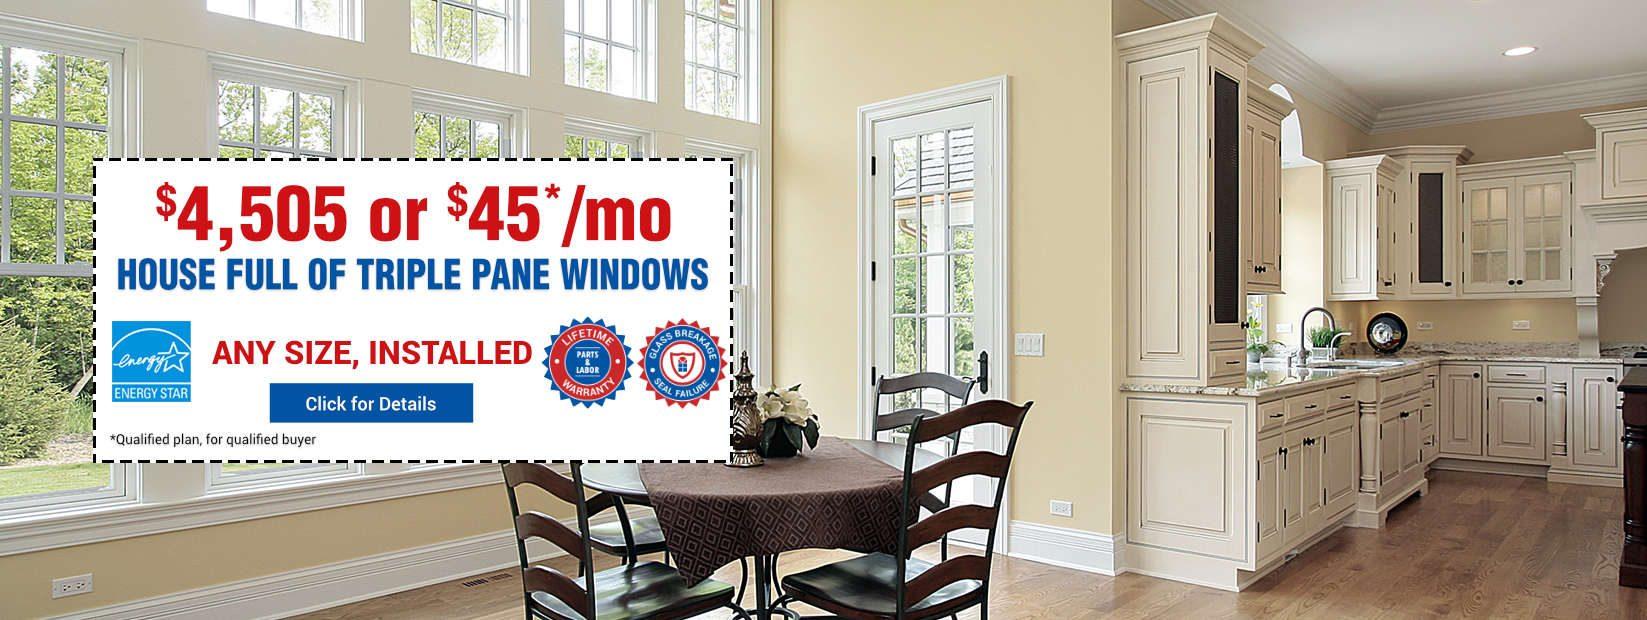 House Full Triple Pane Windows